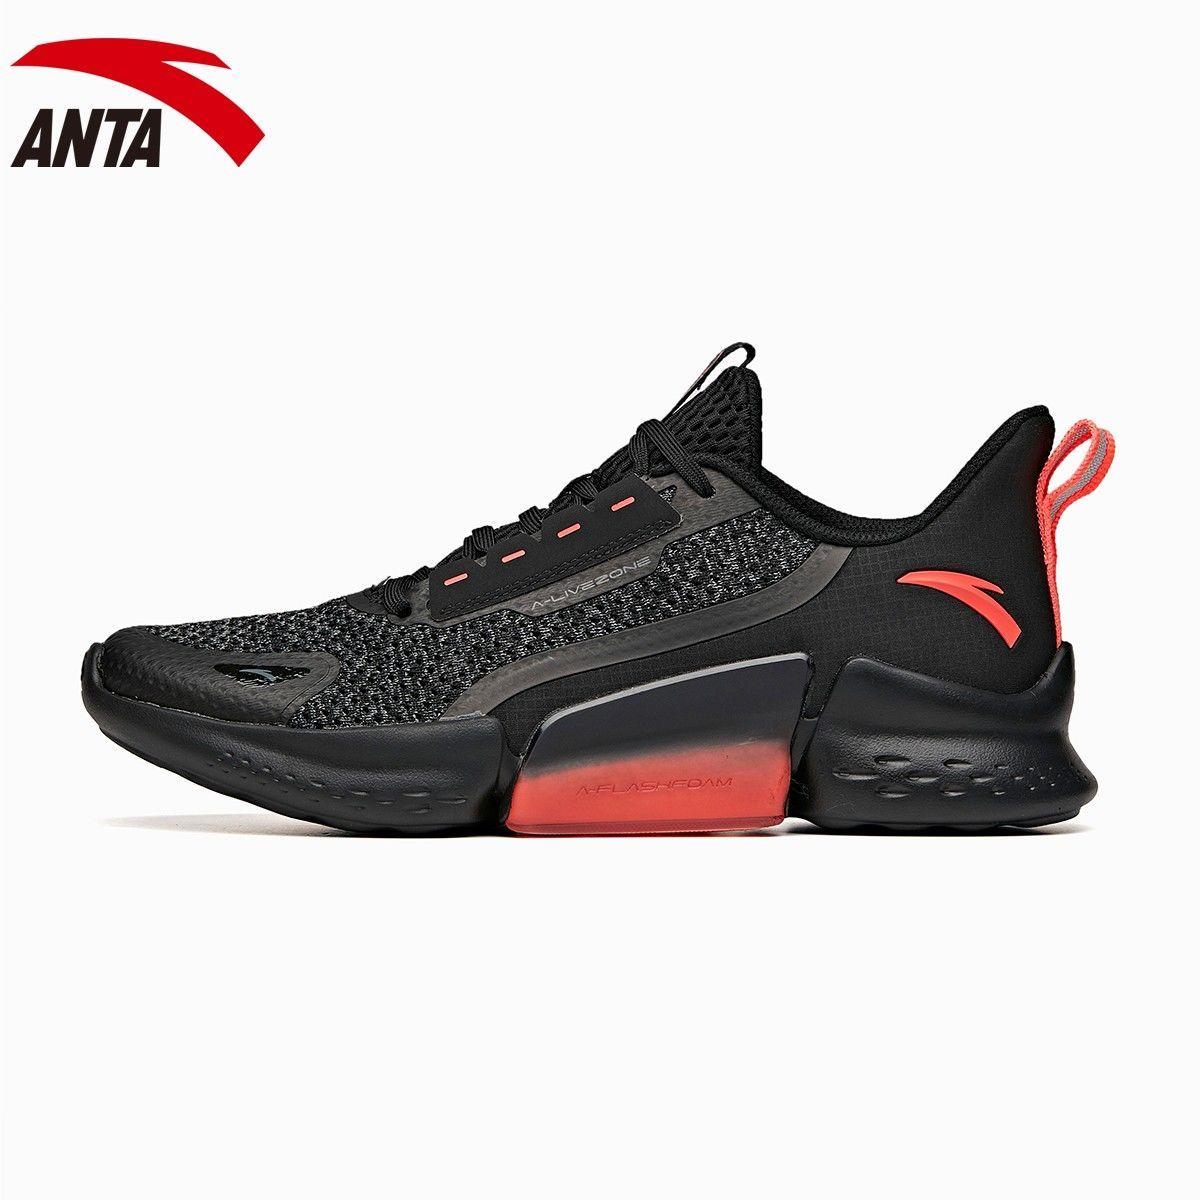 ANTA 安踏  112027786 男款虫洞科技跑步鞋